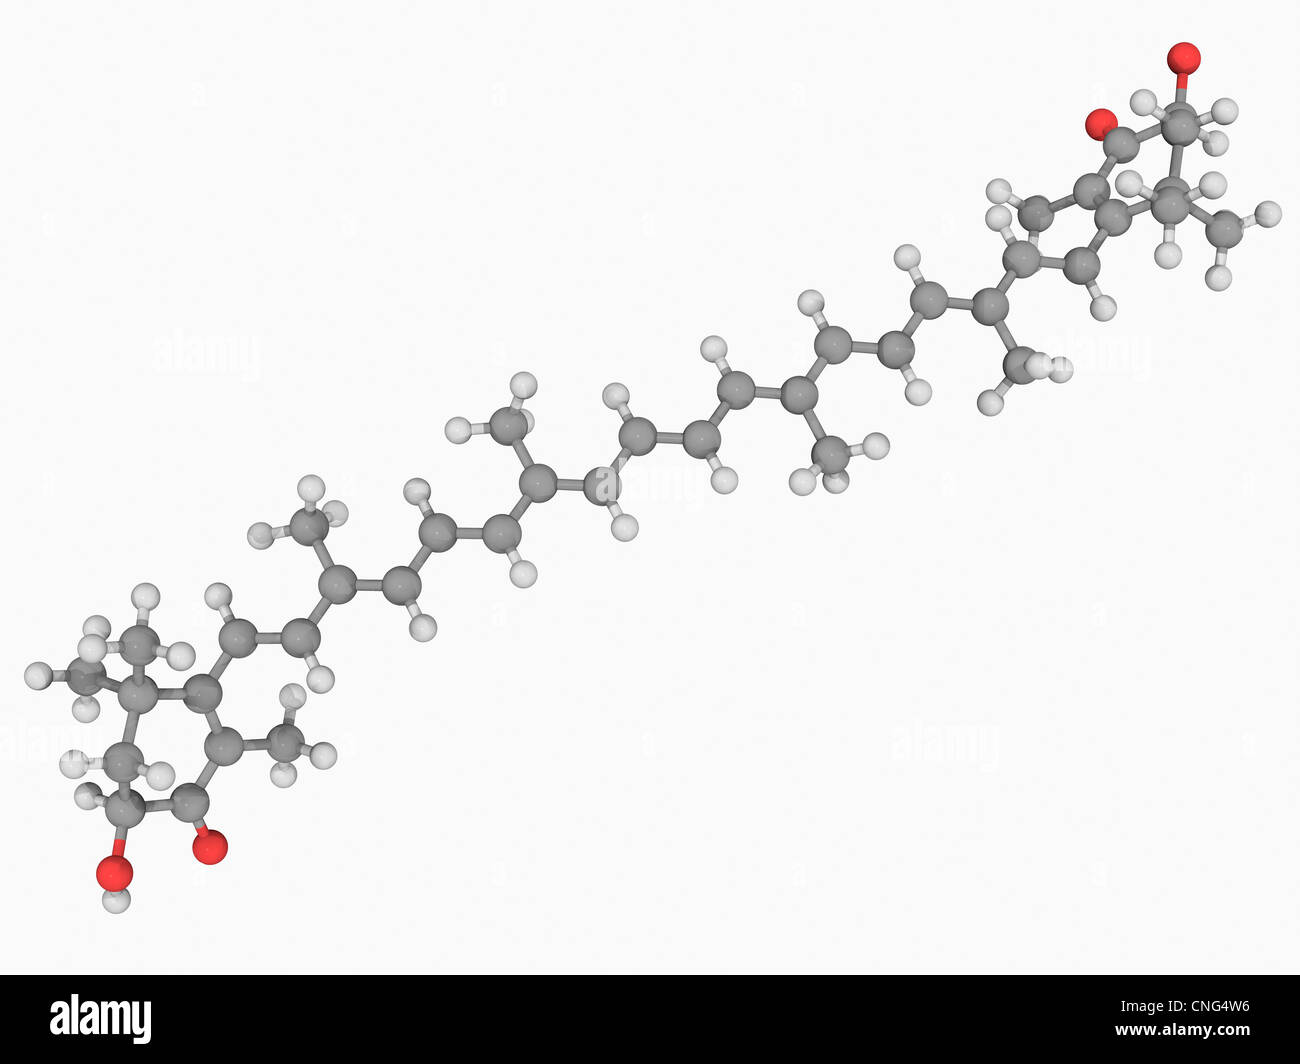 Astaxanthin molecule - Stock Image